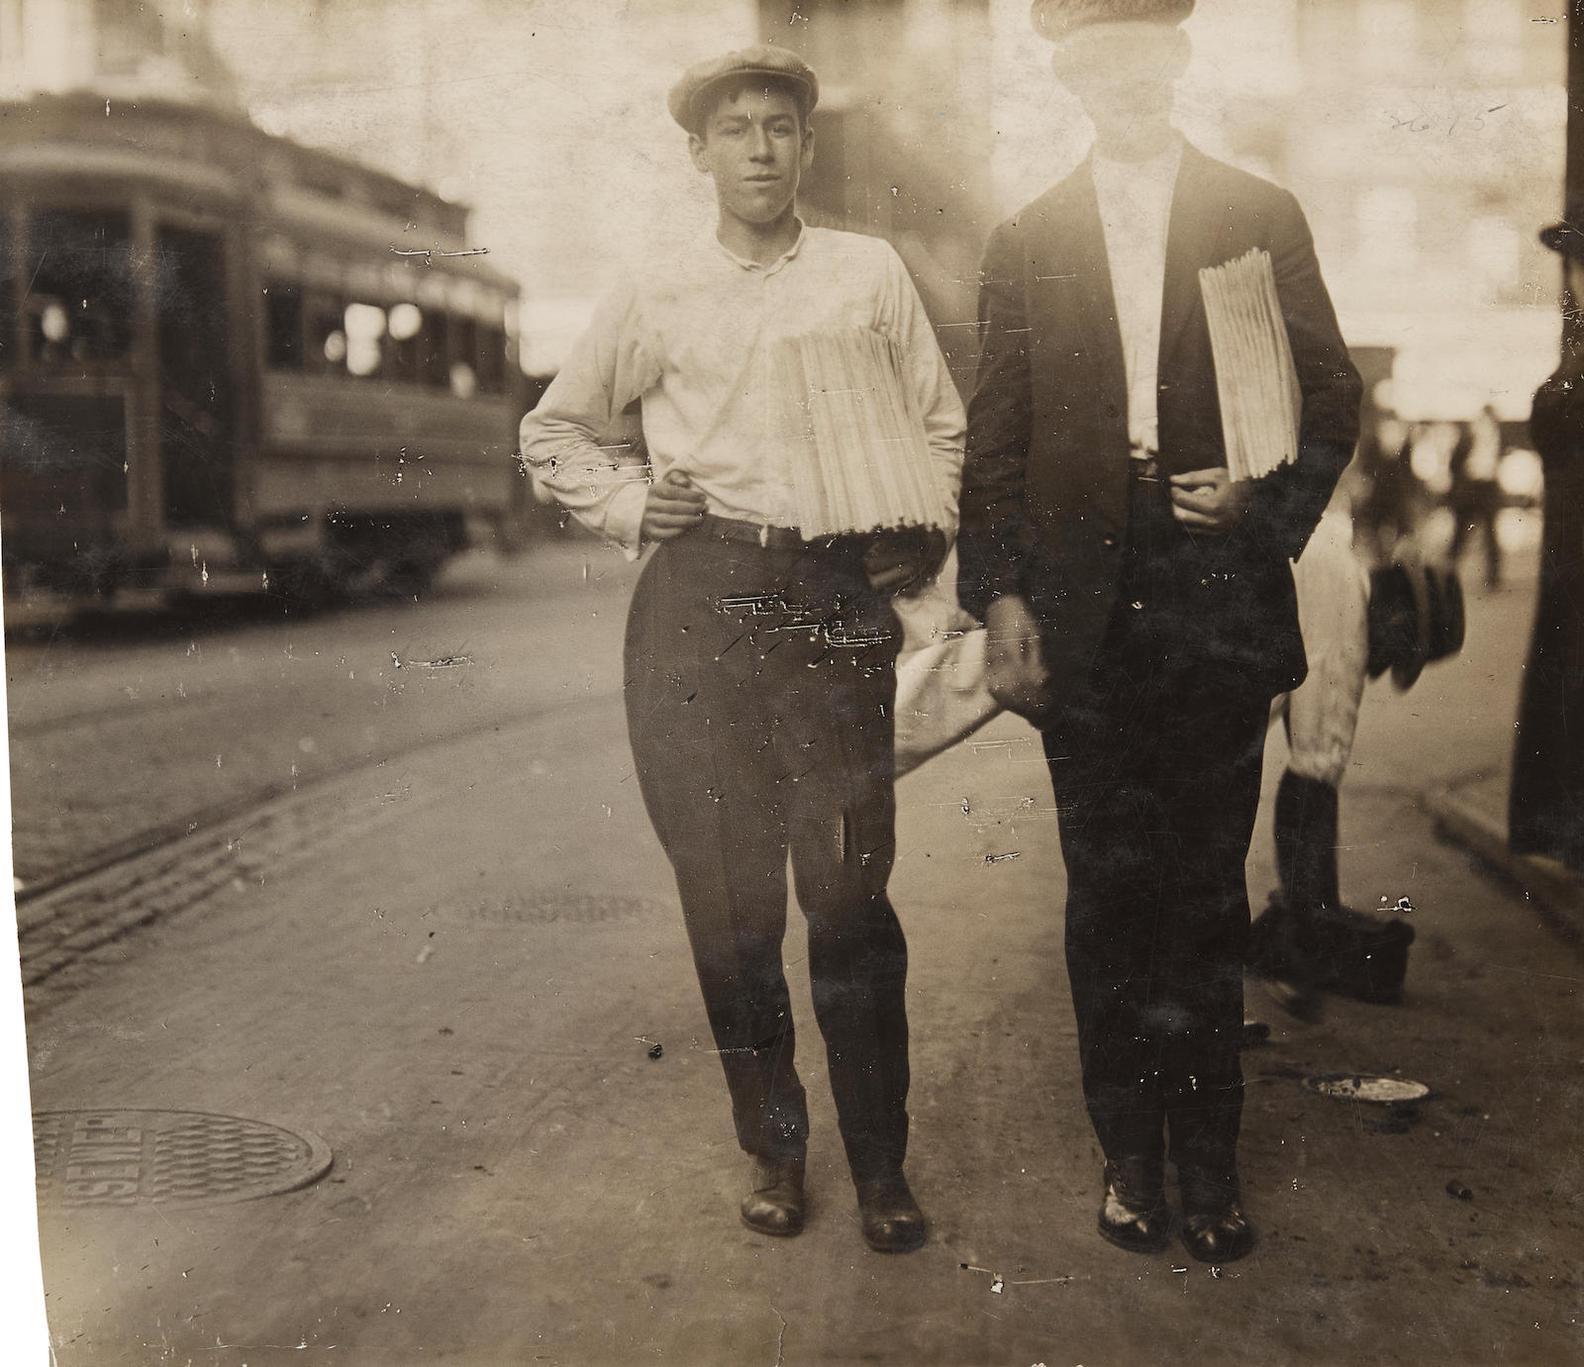 Lewis Wickes Hine-Child Labor Studies-1912